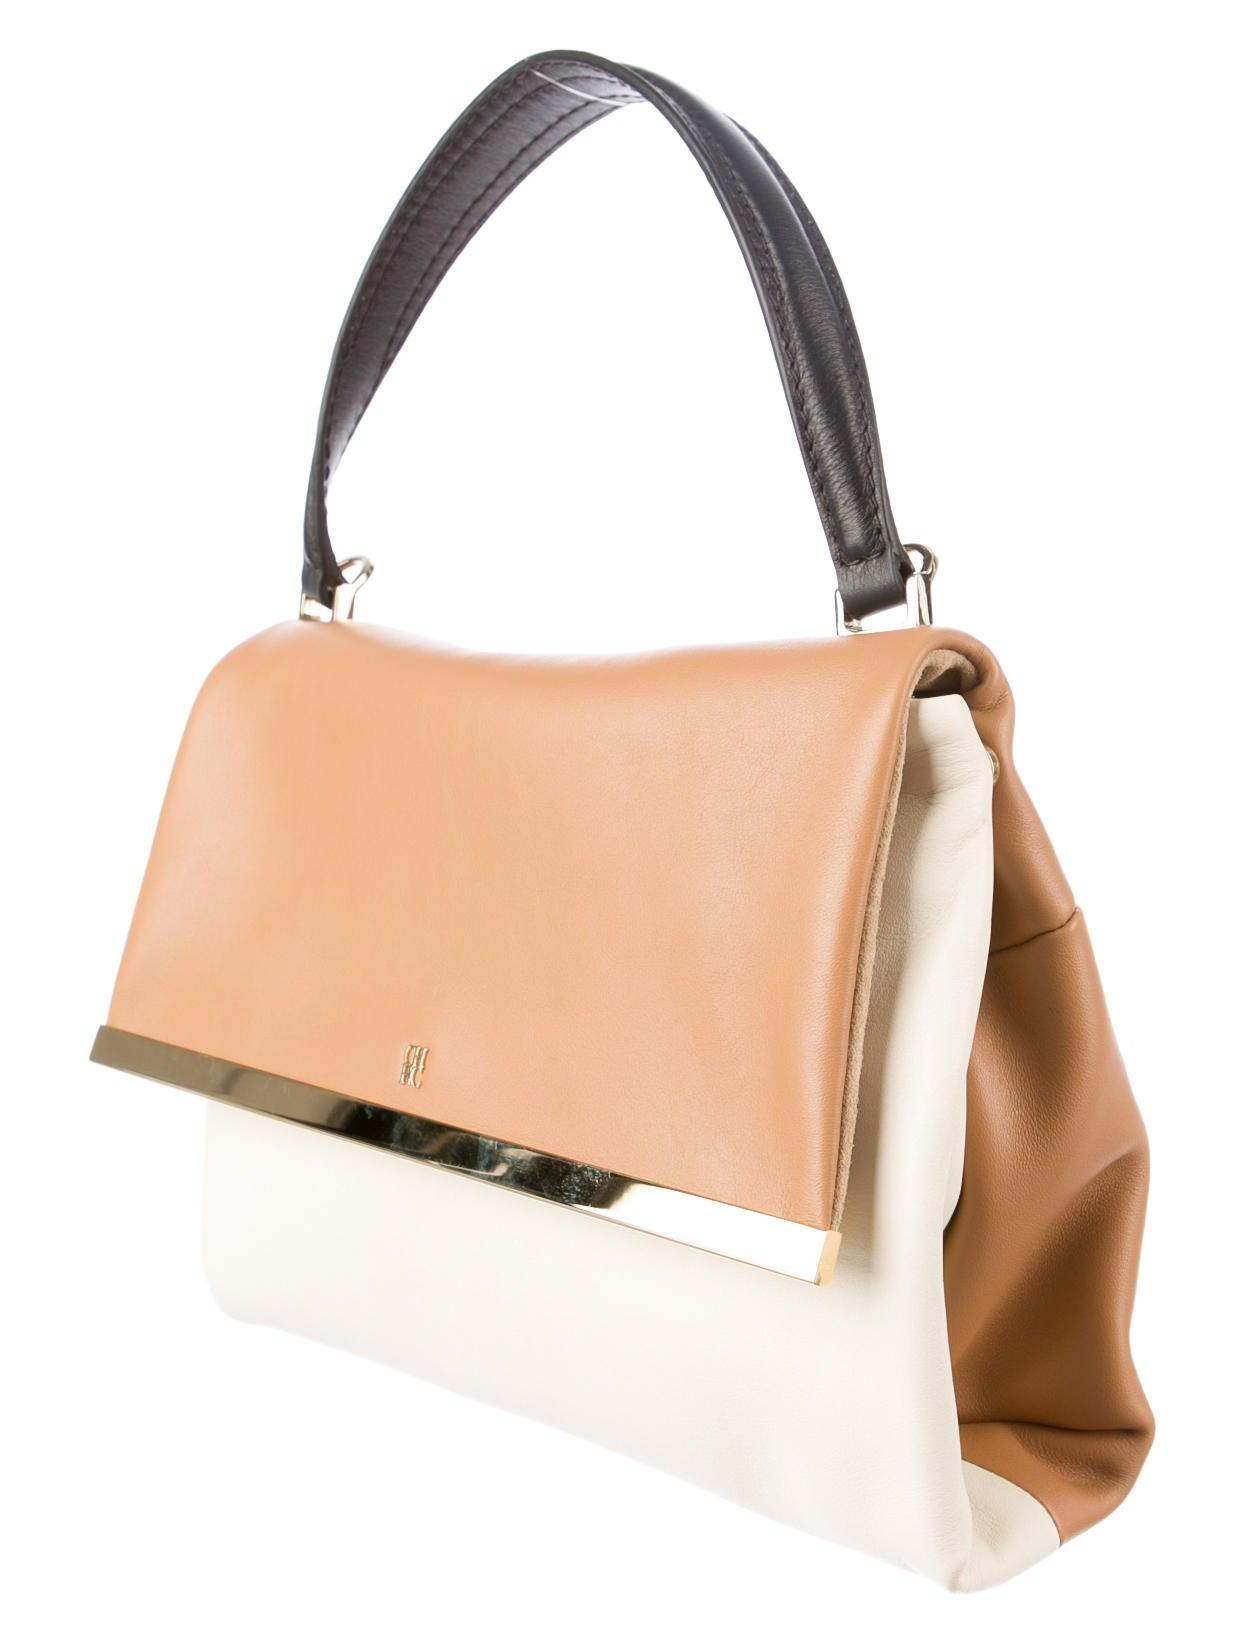 Carolina herrera bags shop online